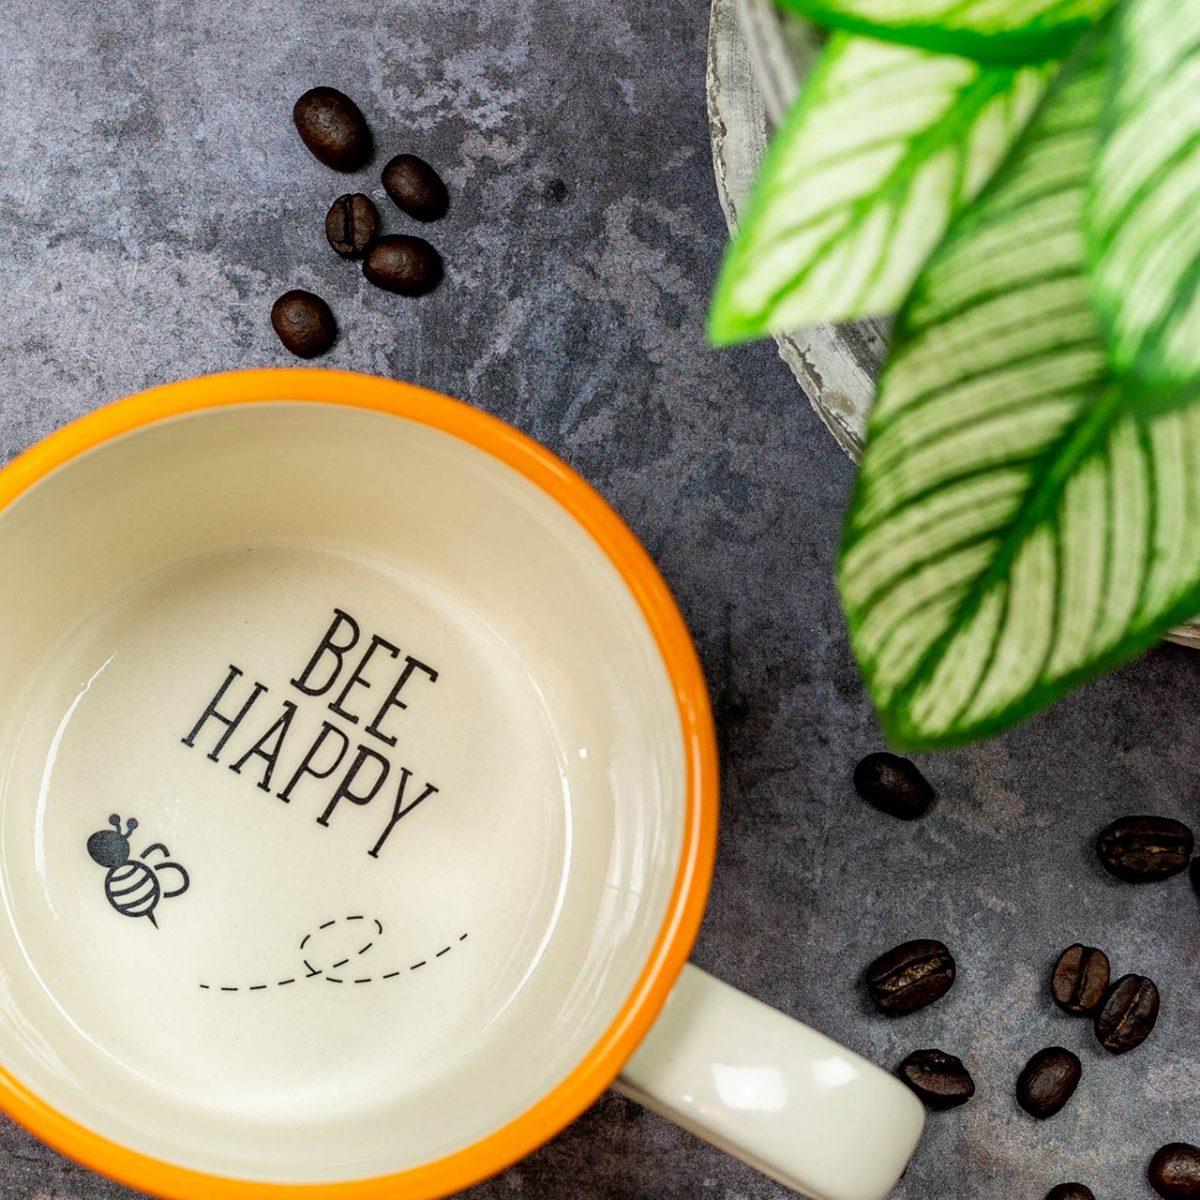 Bee Happy Mug - Kate Ceramics